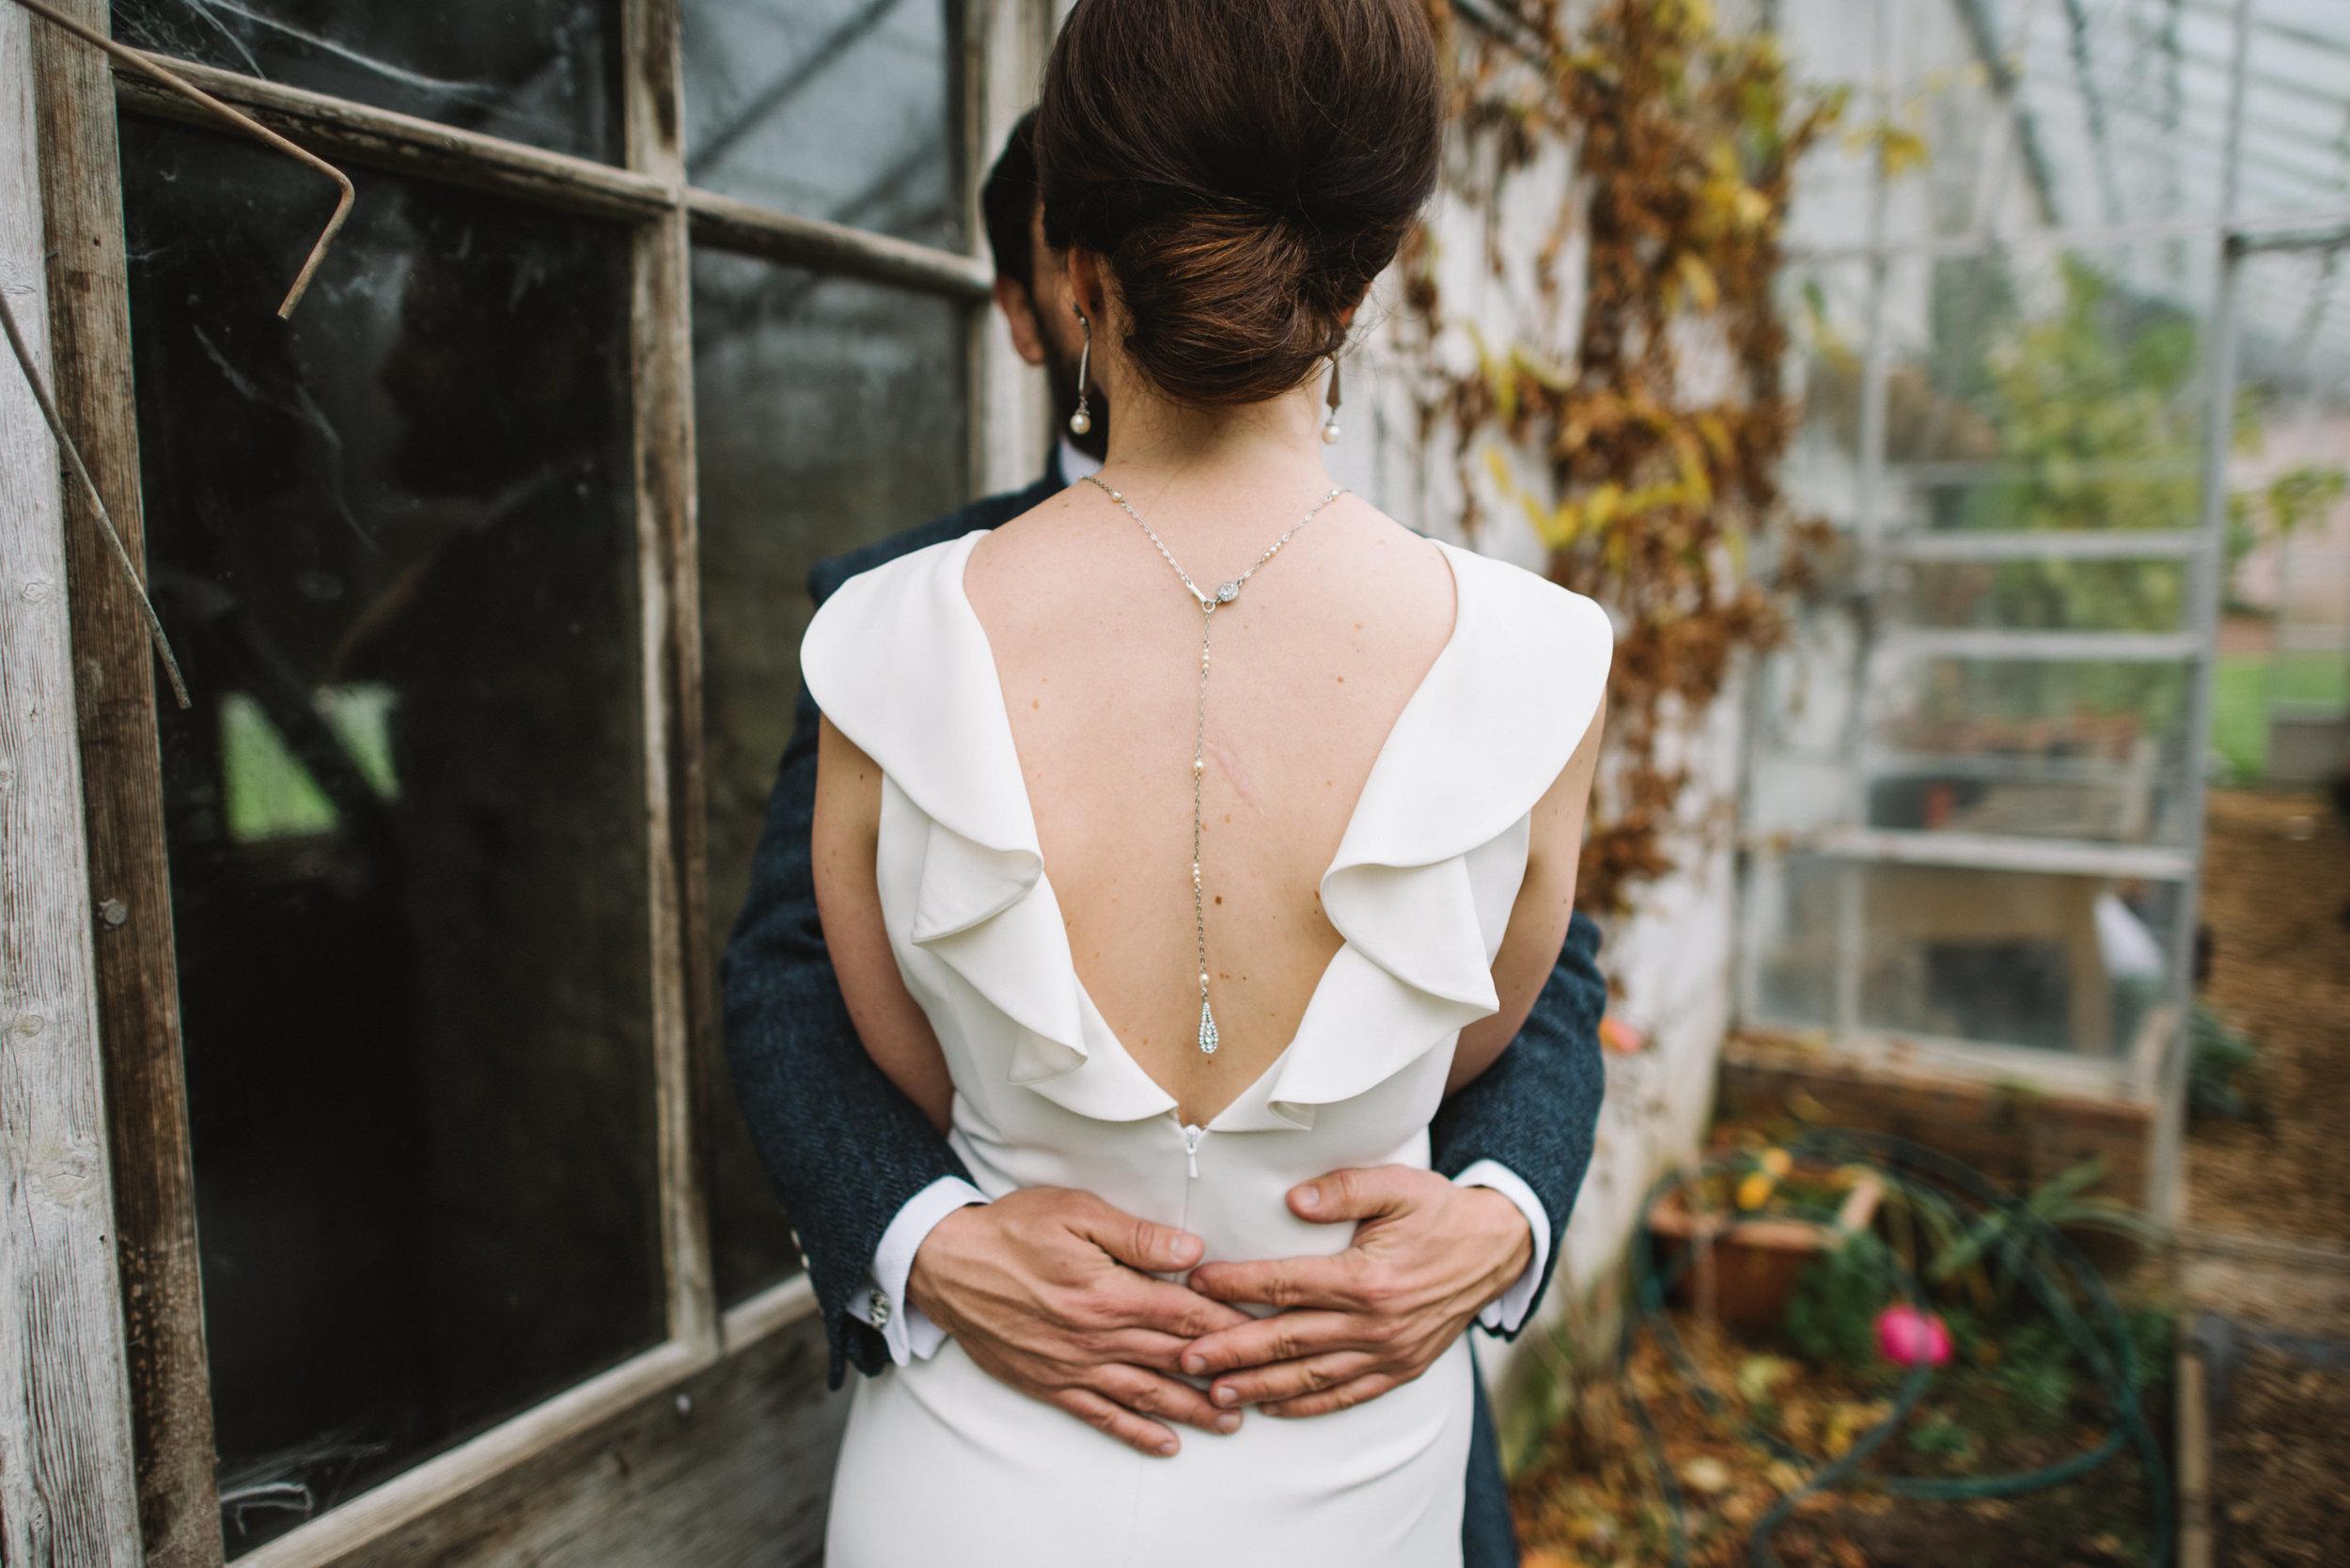 0022-LISA-DEVINE-PHOTOGRAPHY-ALTERNATIVE-WEDDING-PHOTOGRAPHY-SCOTLAND-DESTINATION-WEDDINGS-GLASGOW-WEDDINGS-COOL-WEDDINGS-STYLISH-WEDDINGS.JPG